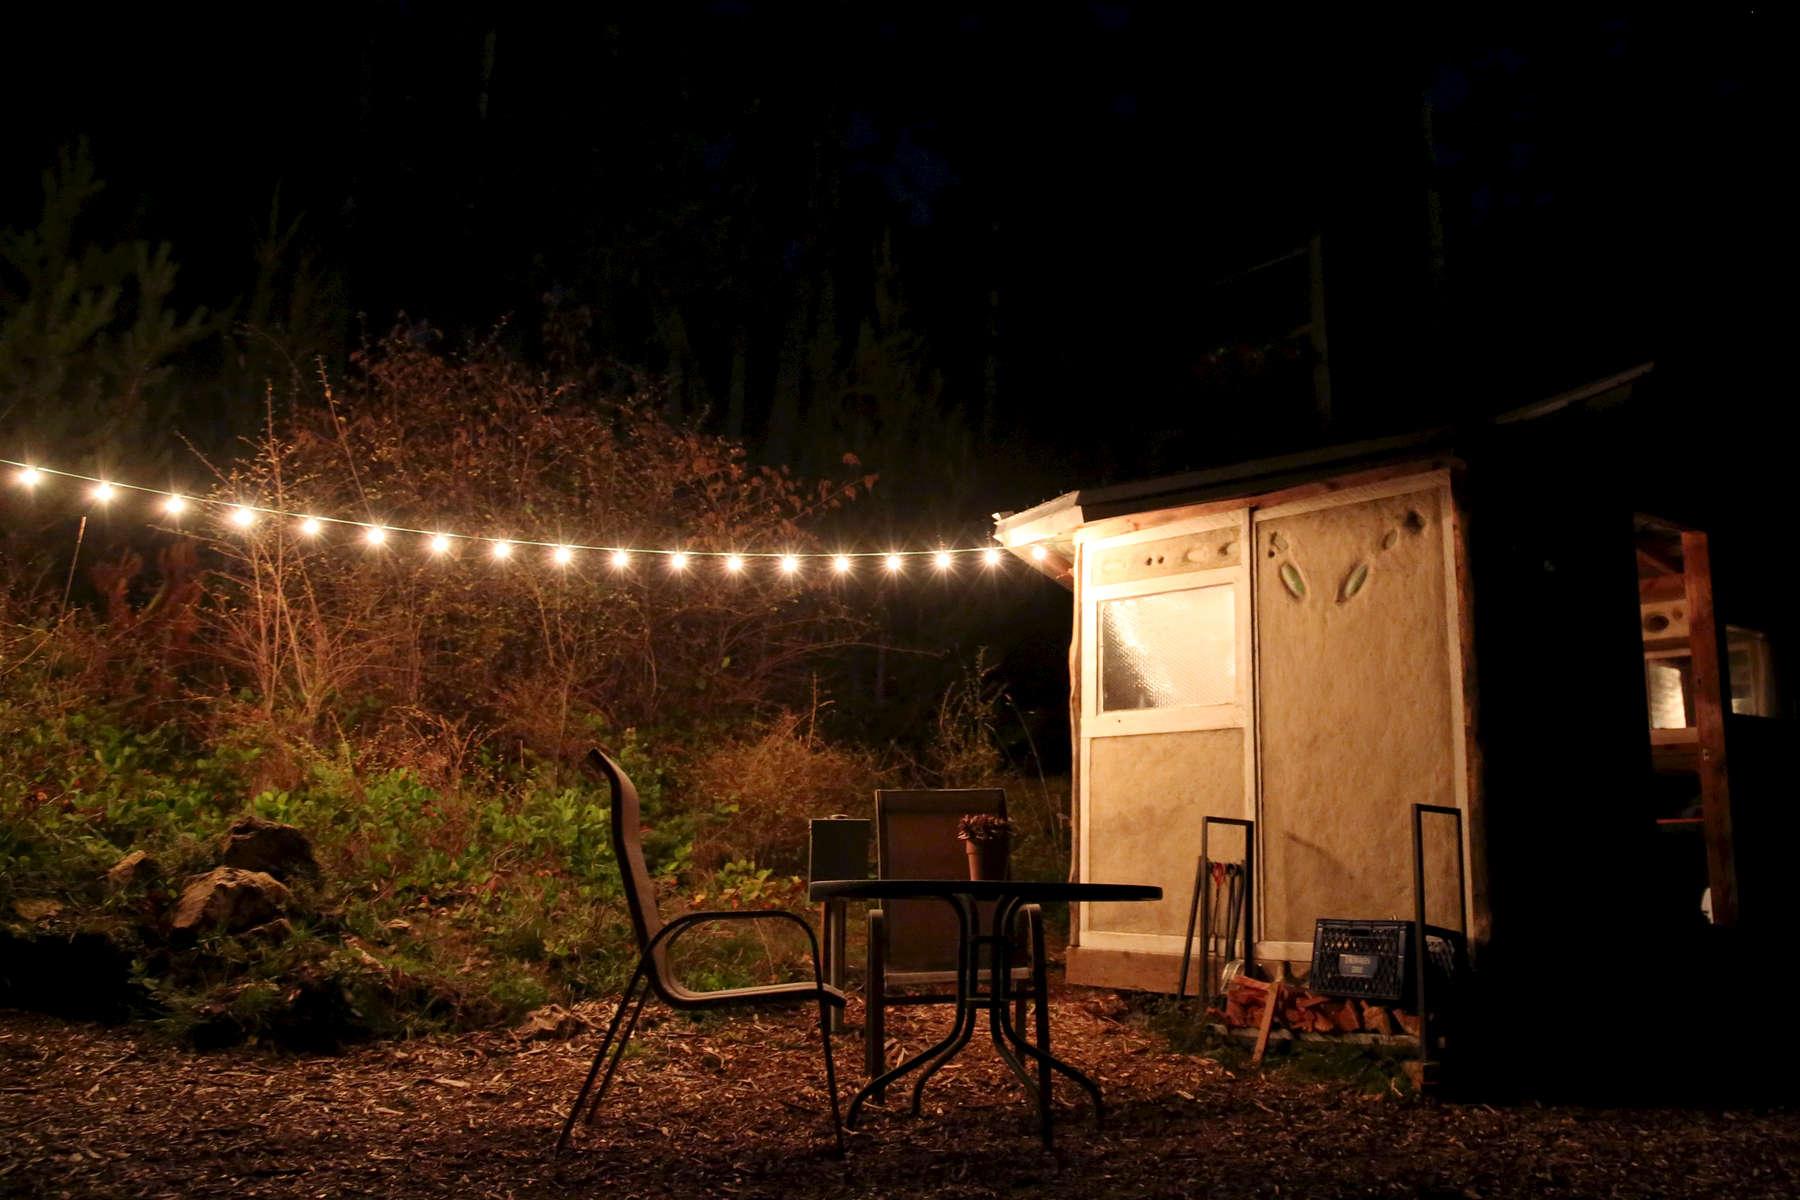 A string of lights illuminates a campsite on San Juan Island.